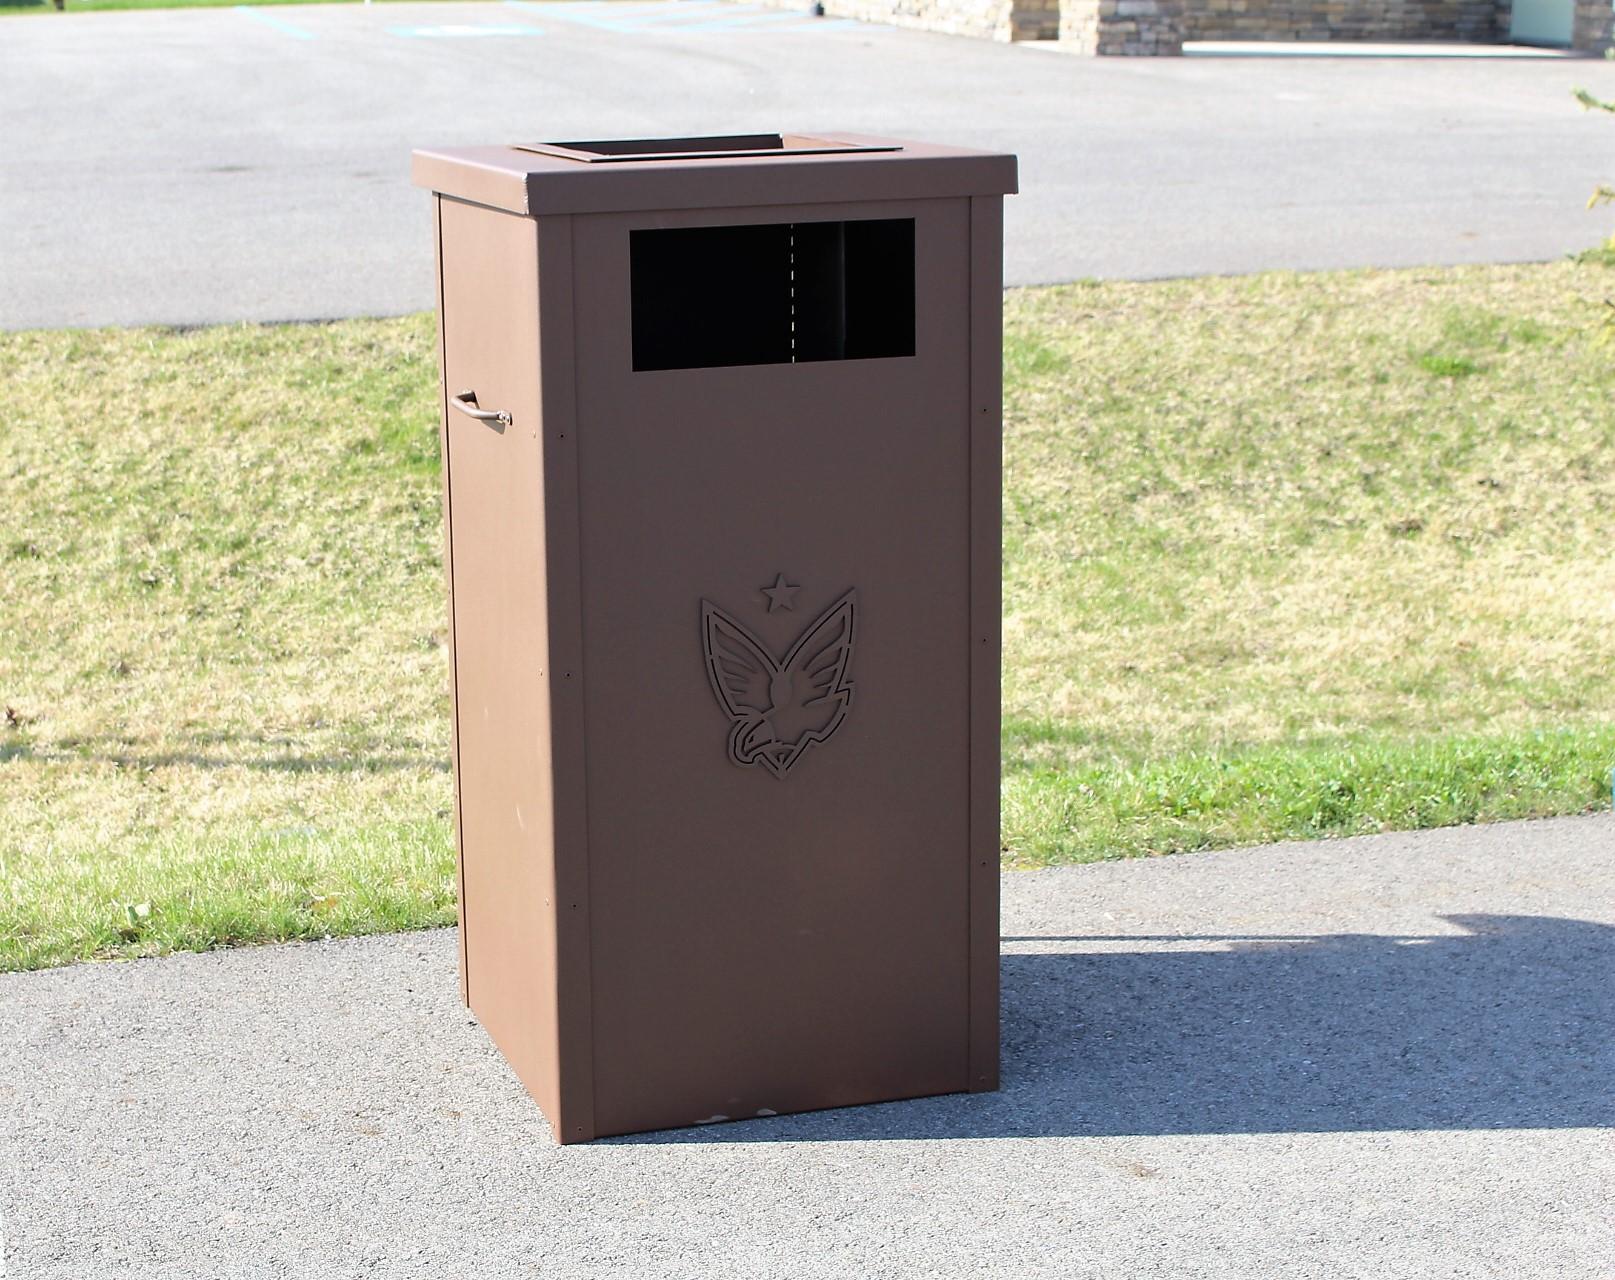 Garbage Can Enclosure -The Patriot